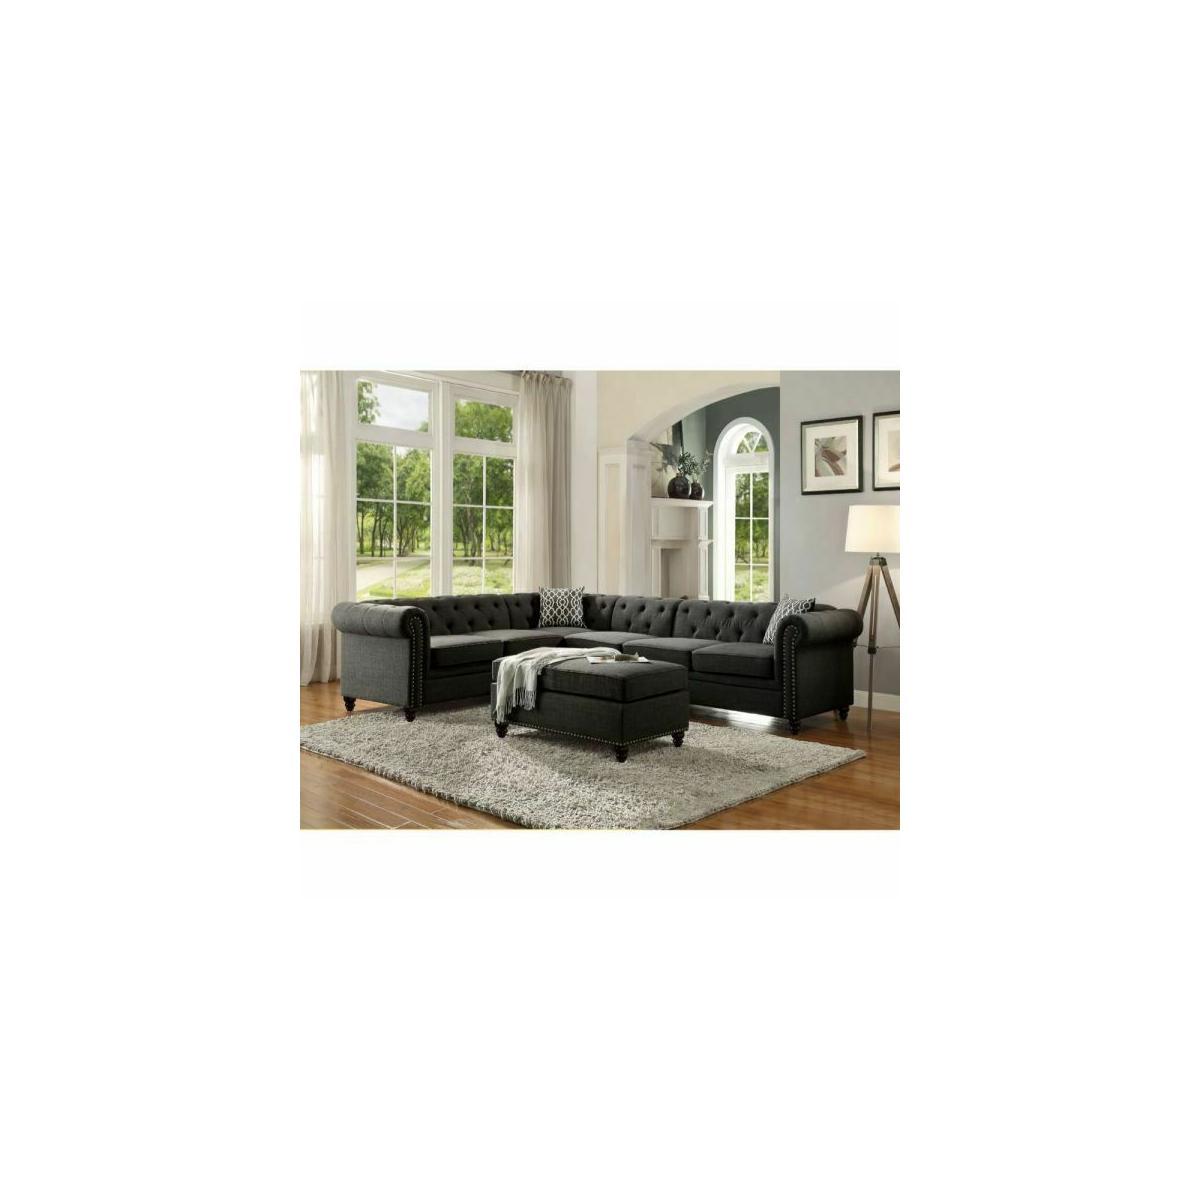 See Details - Aurelia II Sectional Sofa